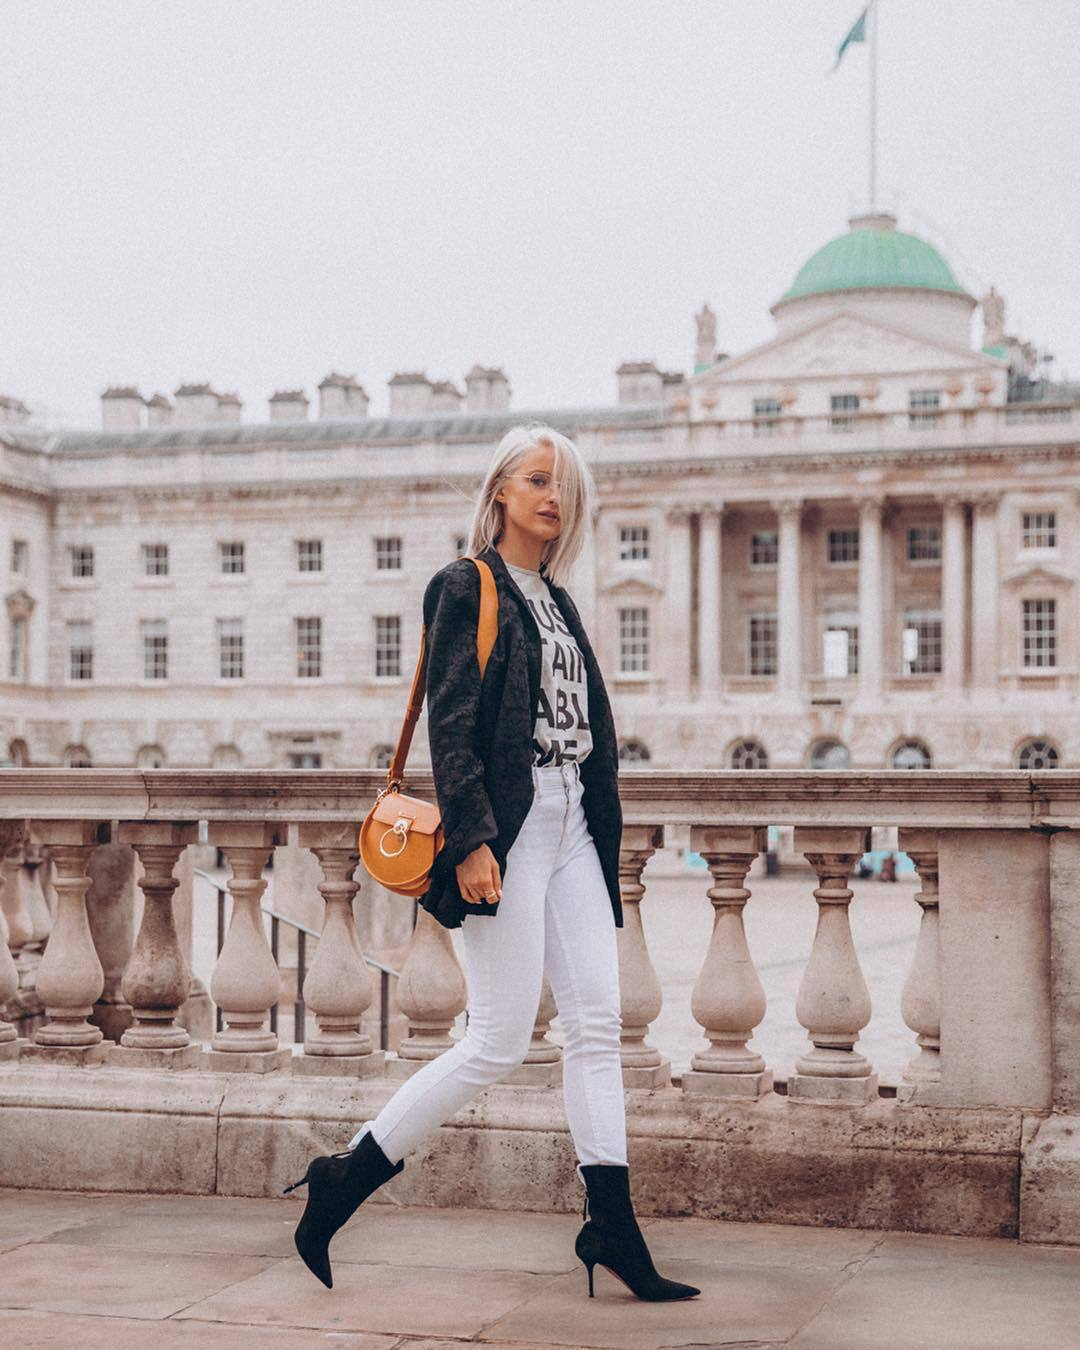 jeans white jeans skinny jeans black boots heel boots black blazer orange bag white t-shirt